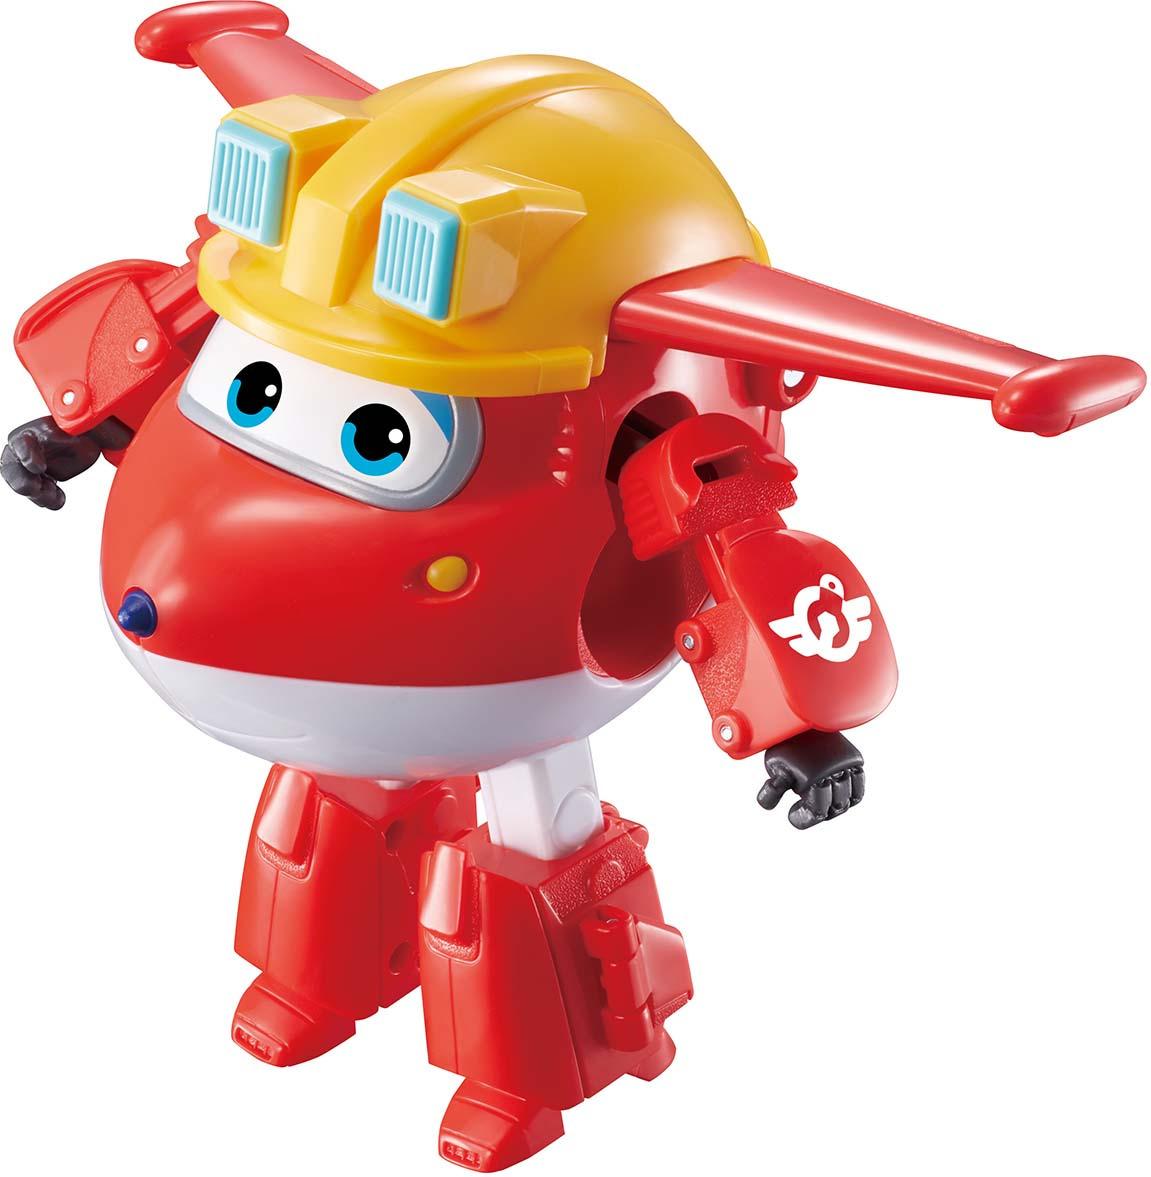 все цены на Трансформер Super Wings Джетт команда Строителей онлайн